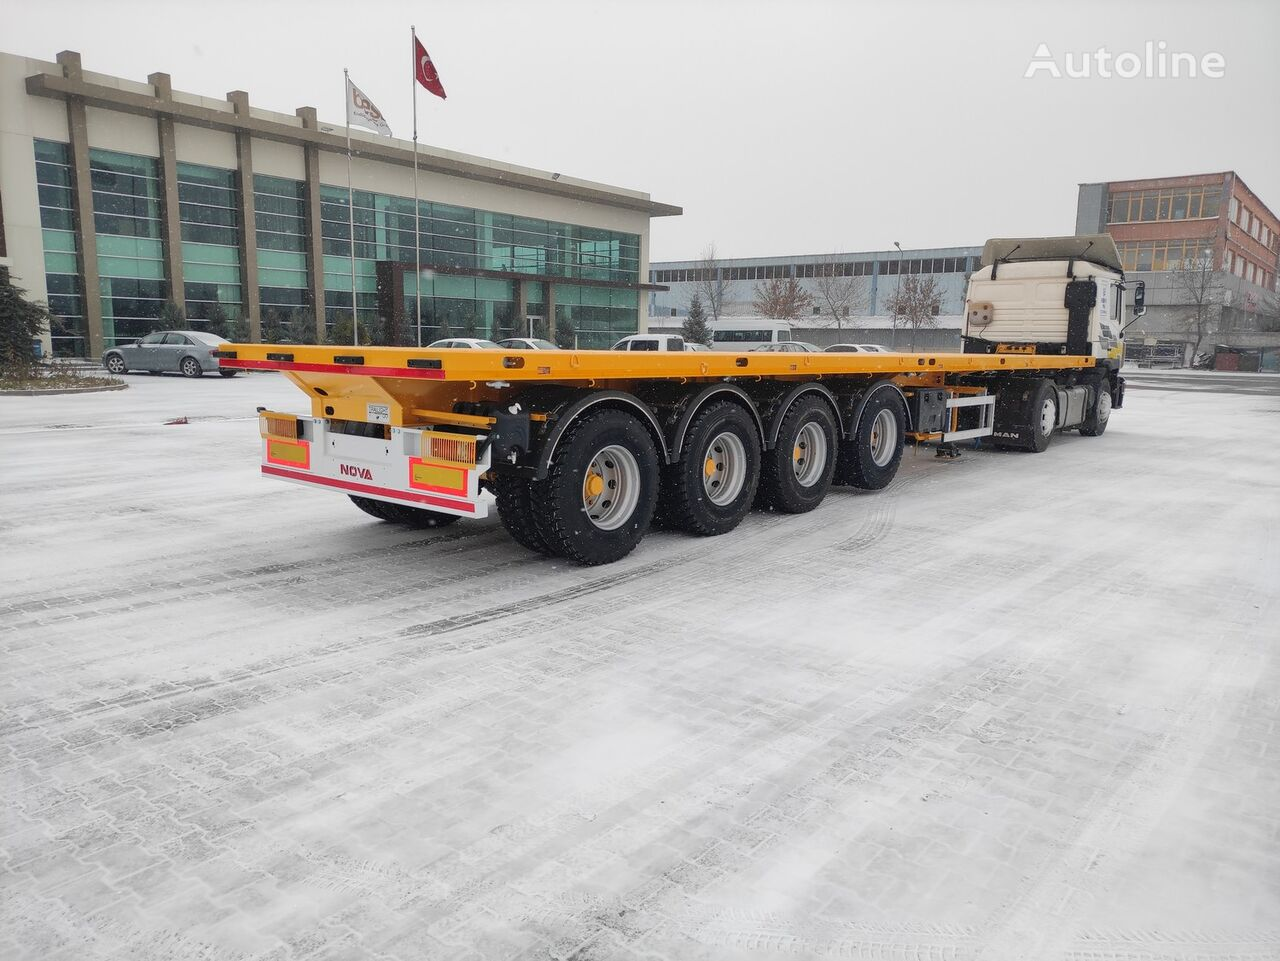 NOVA NEW FLATBED TRAILER 4 AXLE PRODUCTION semirremolque plataforma nuevo